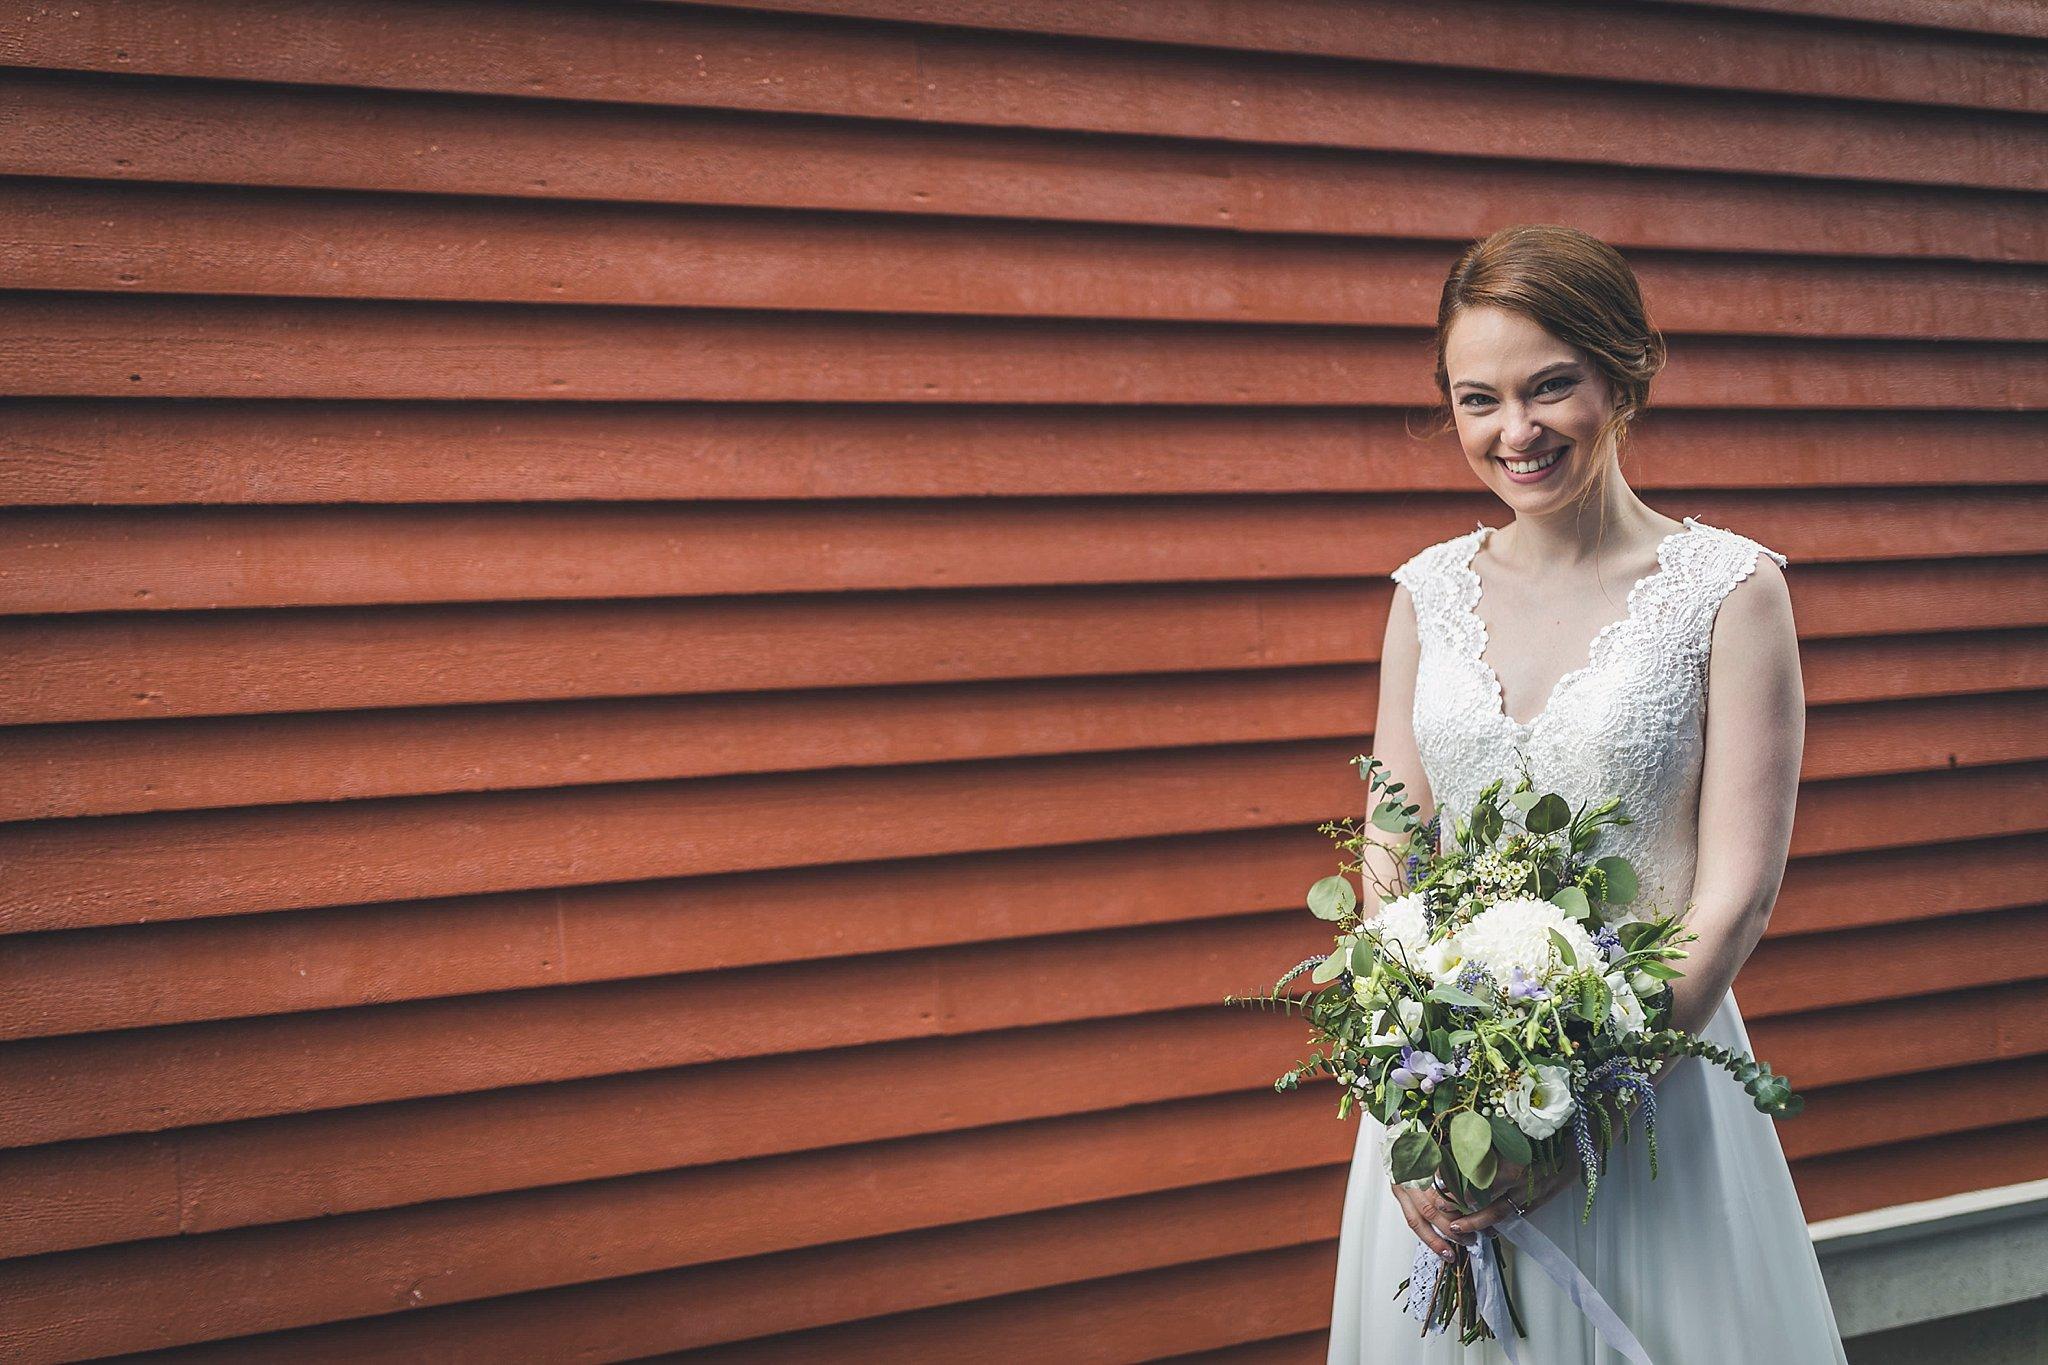 Brideal portrait by St. John's, Newfoundland wedding photographer JP Mullowney